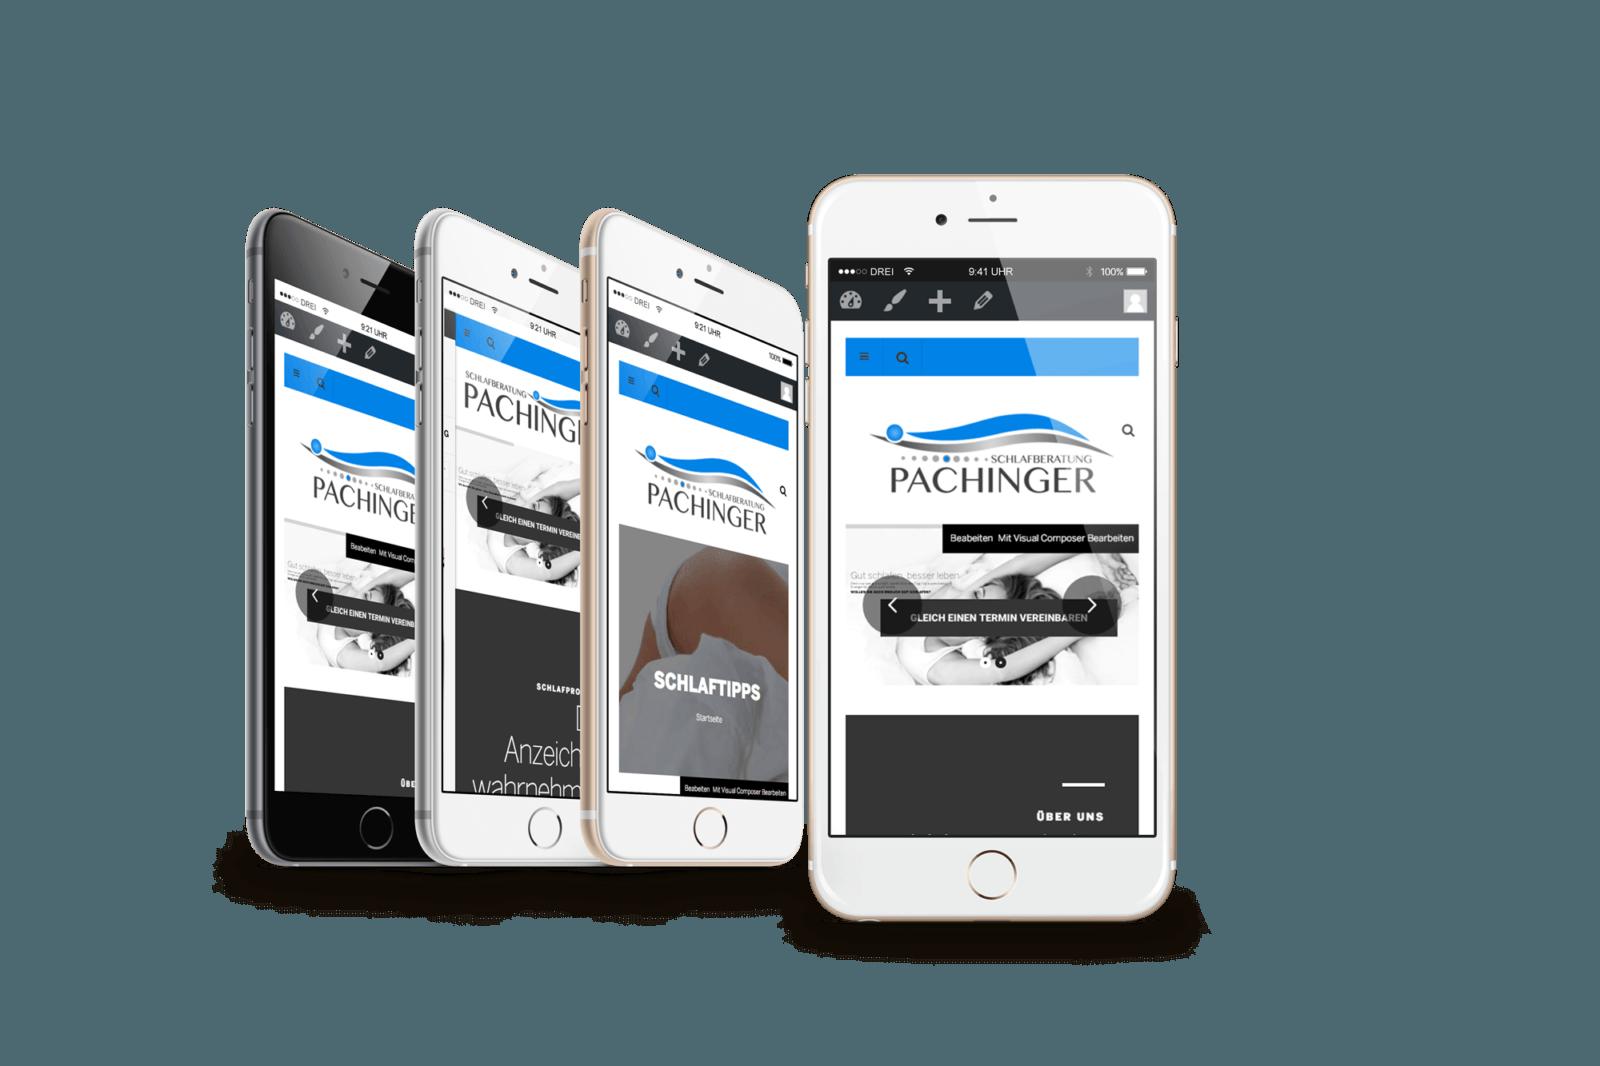 schlafberatung-iphone6-info